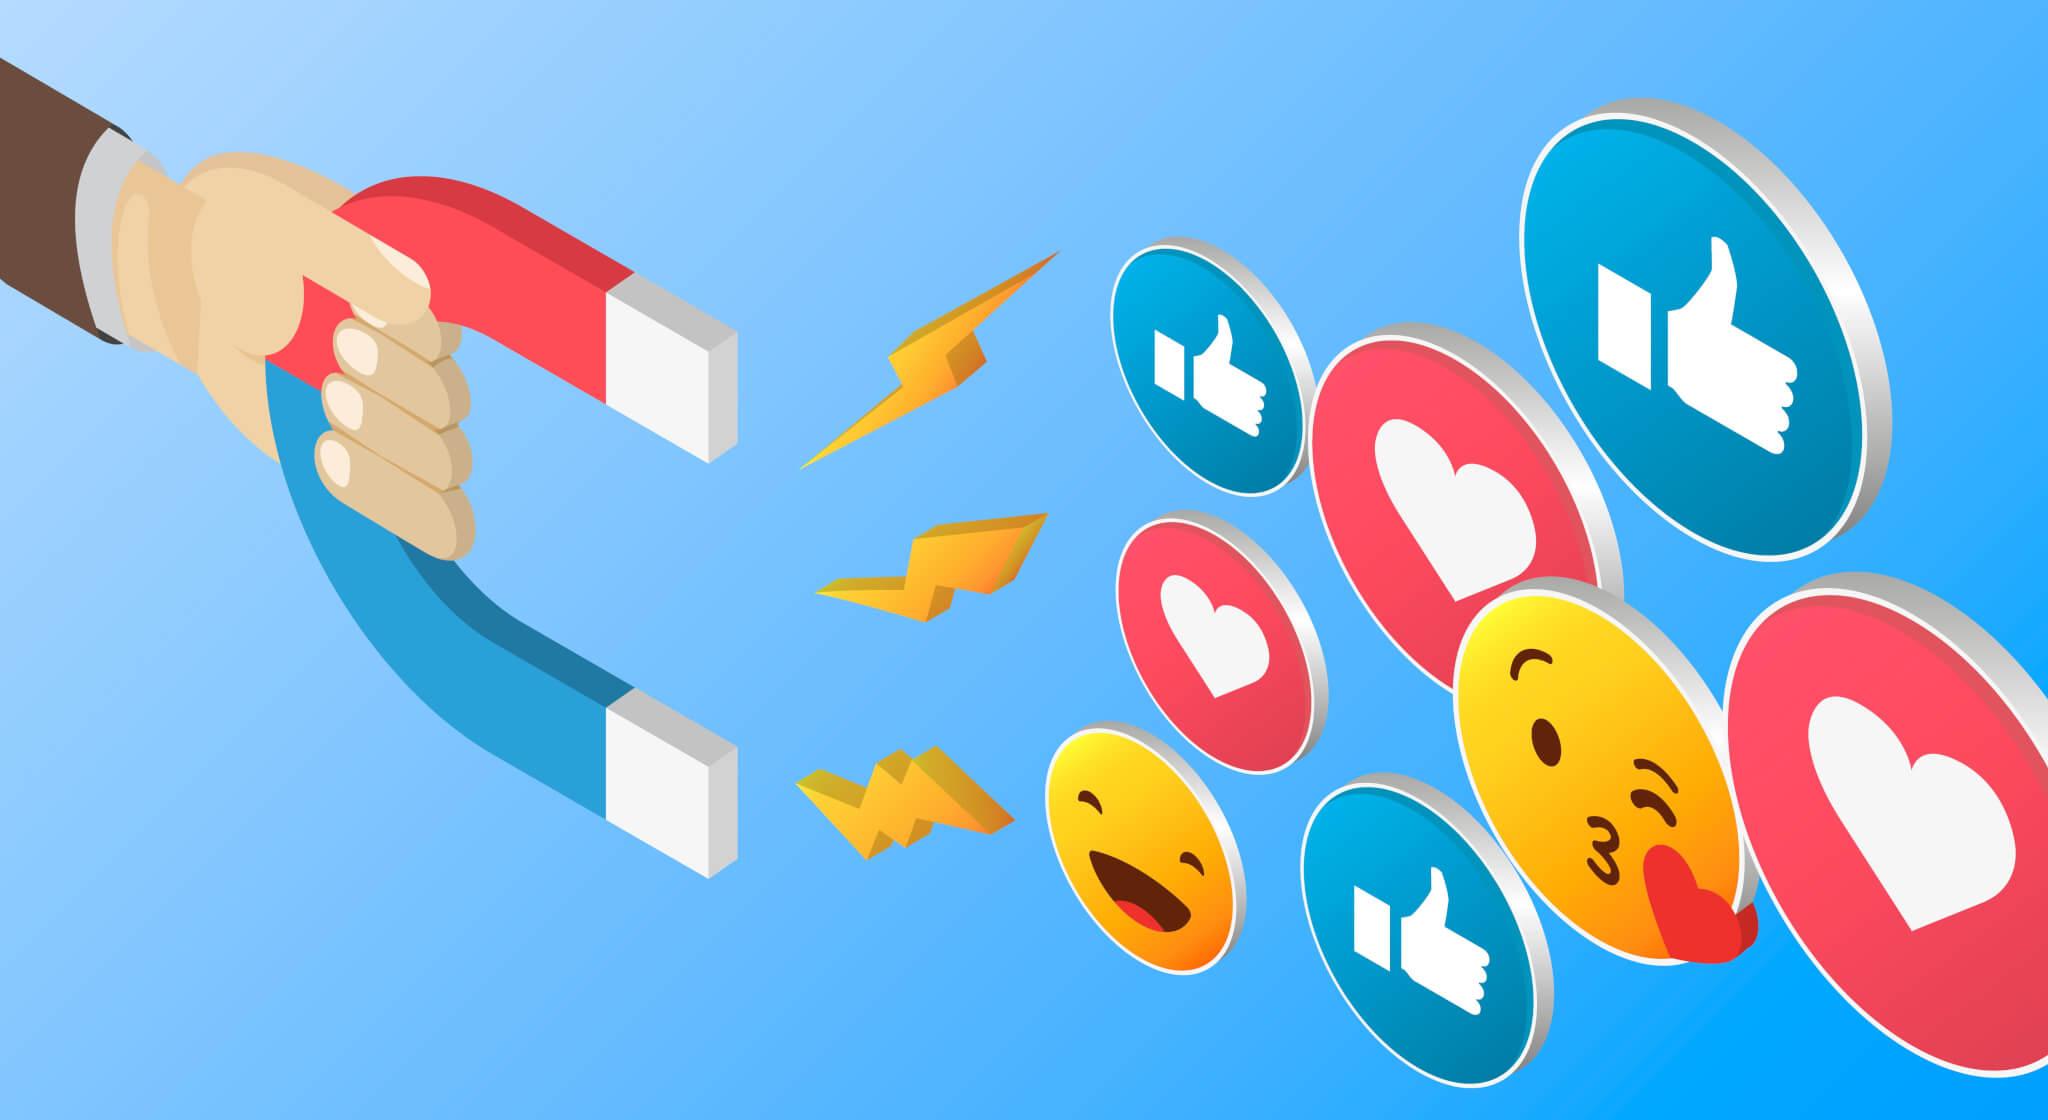 magnet and emojis